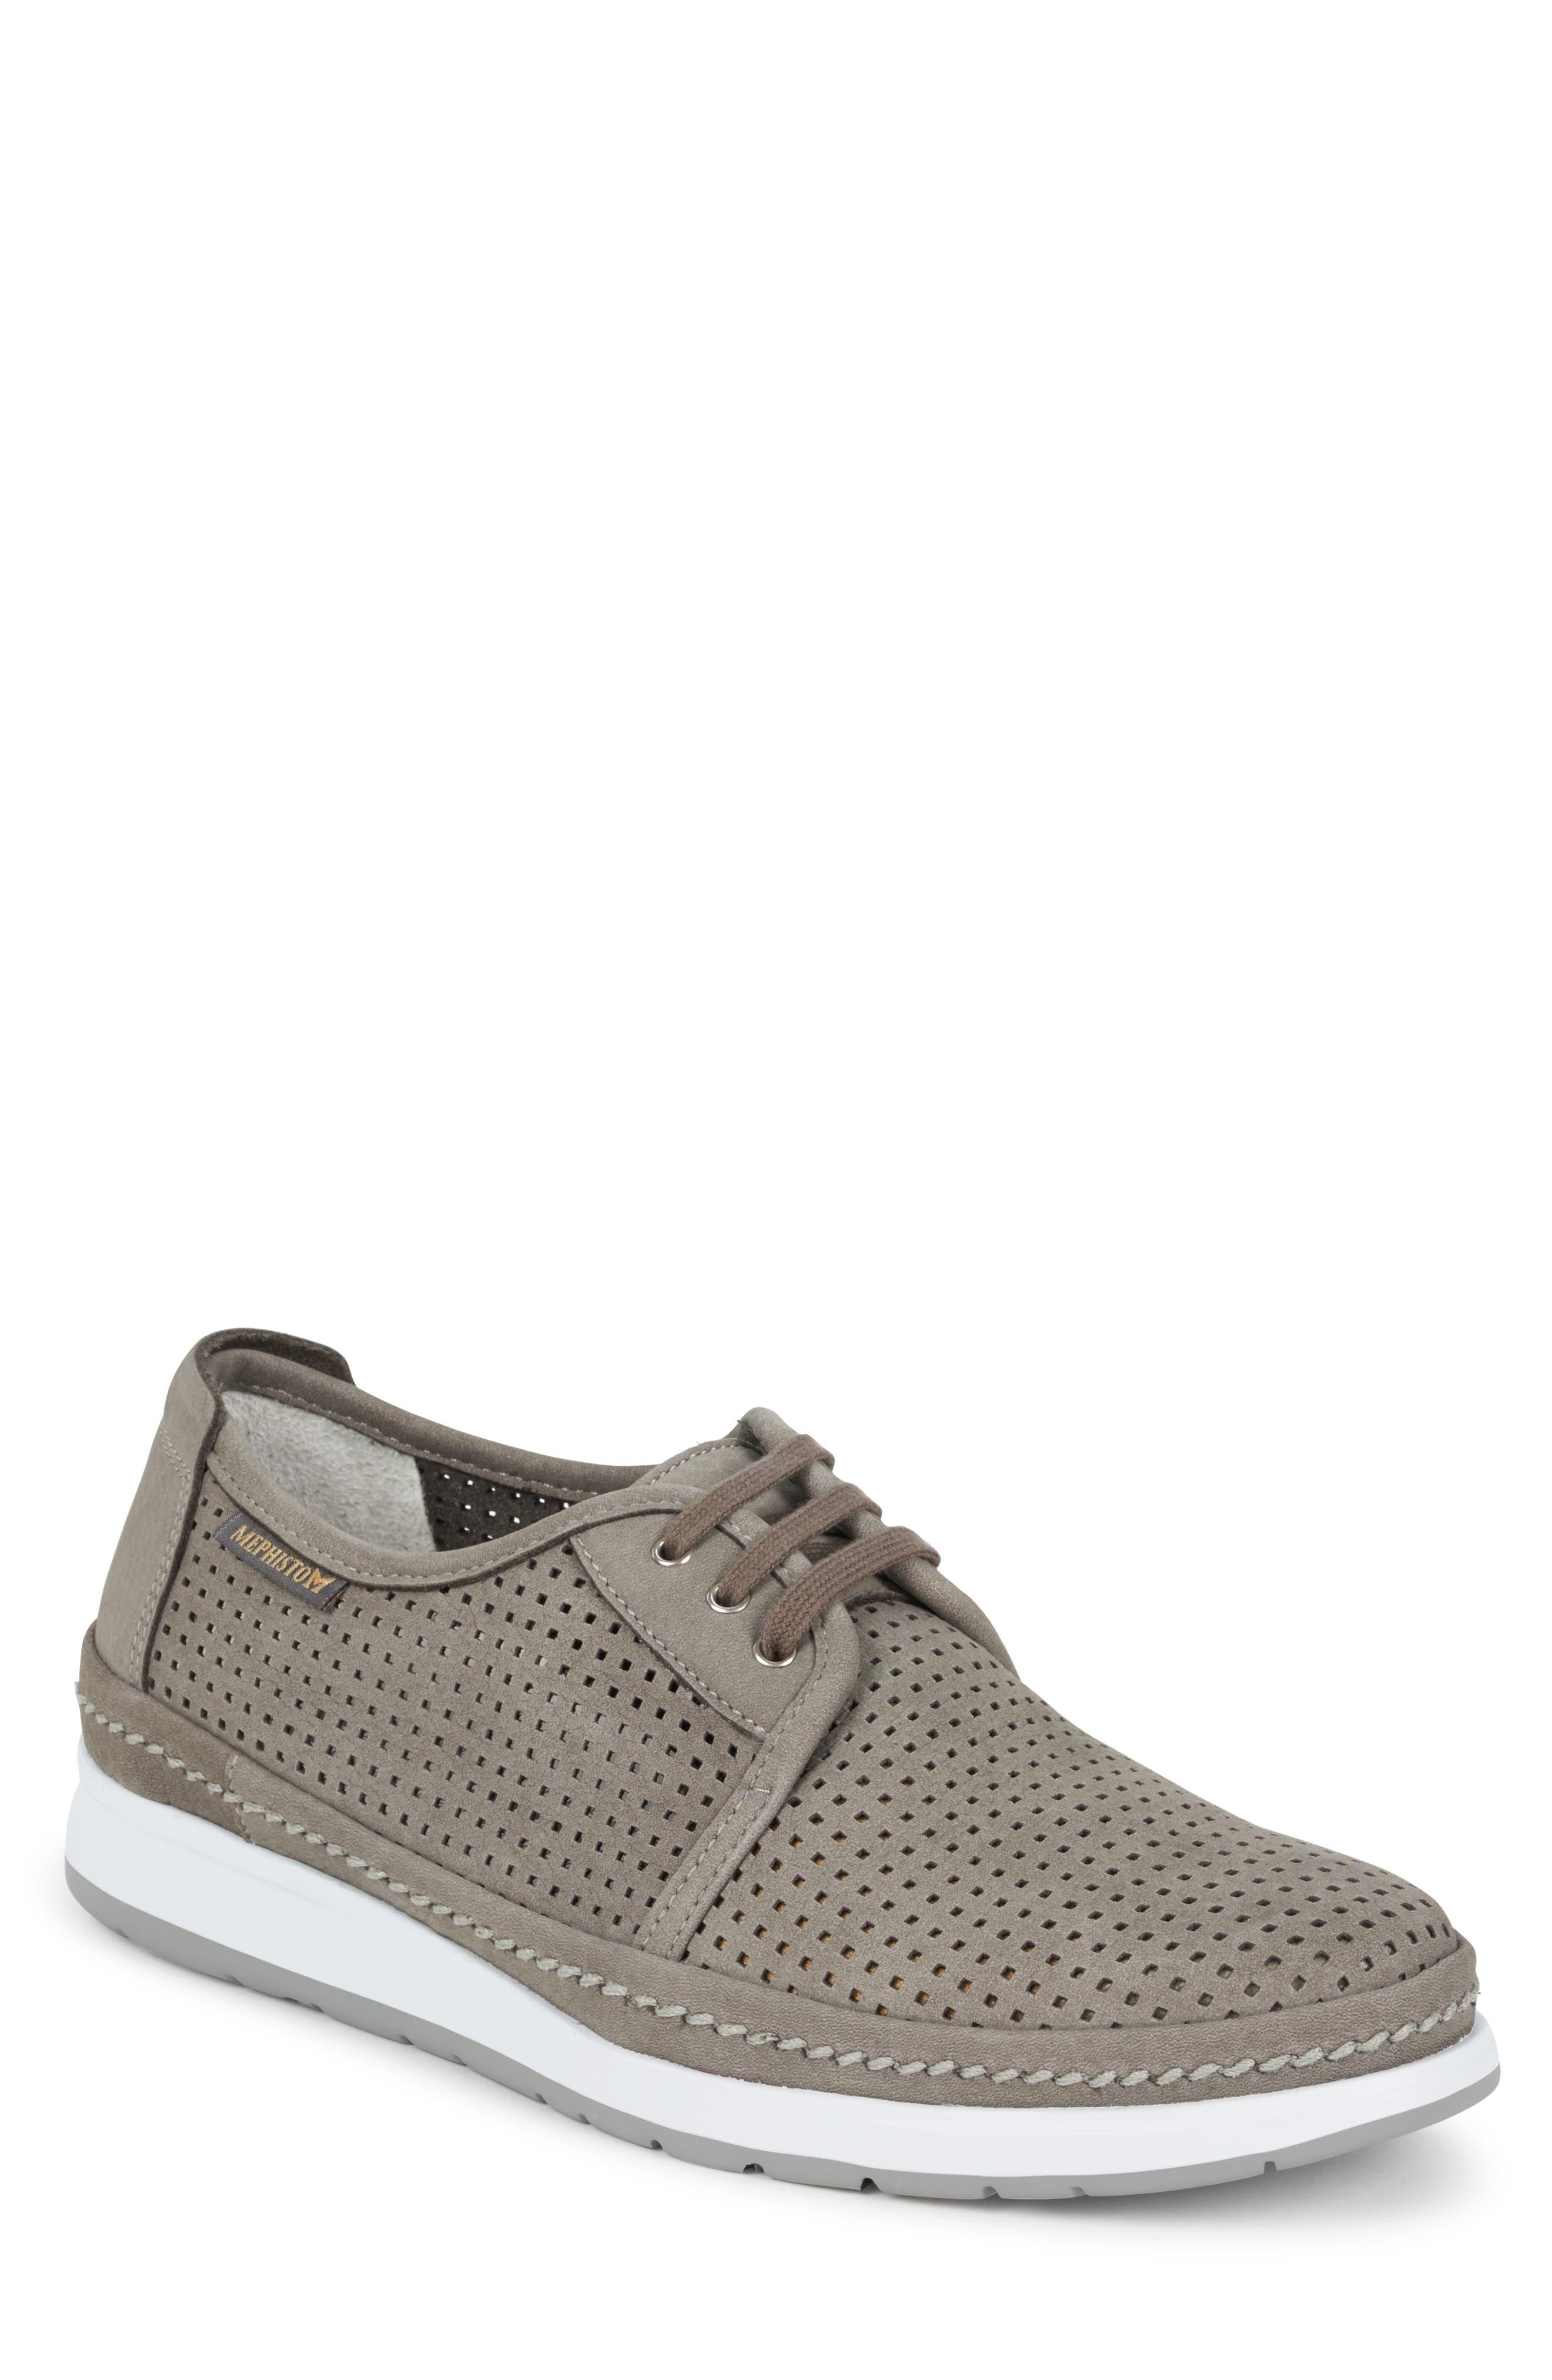 Mephisto Harry Sneaker, Grey